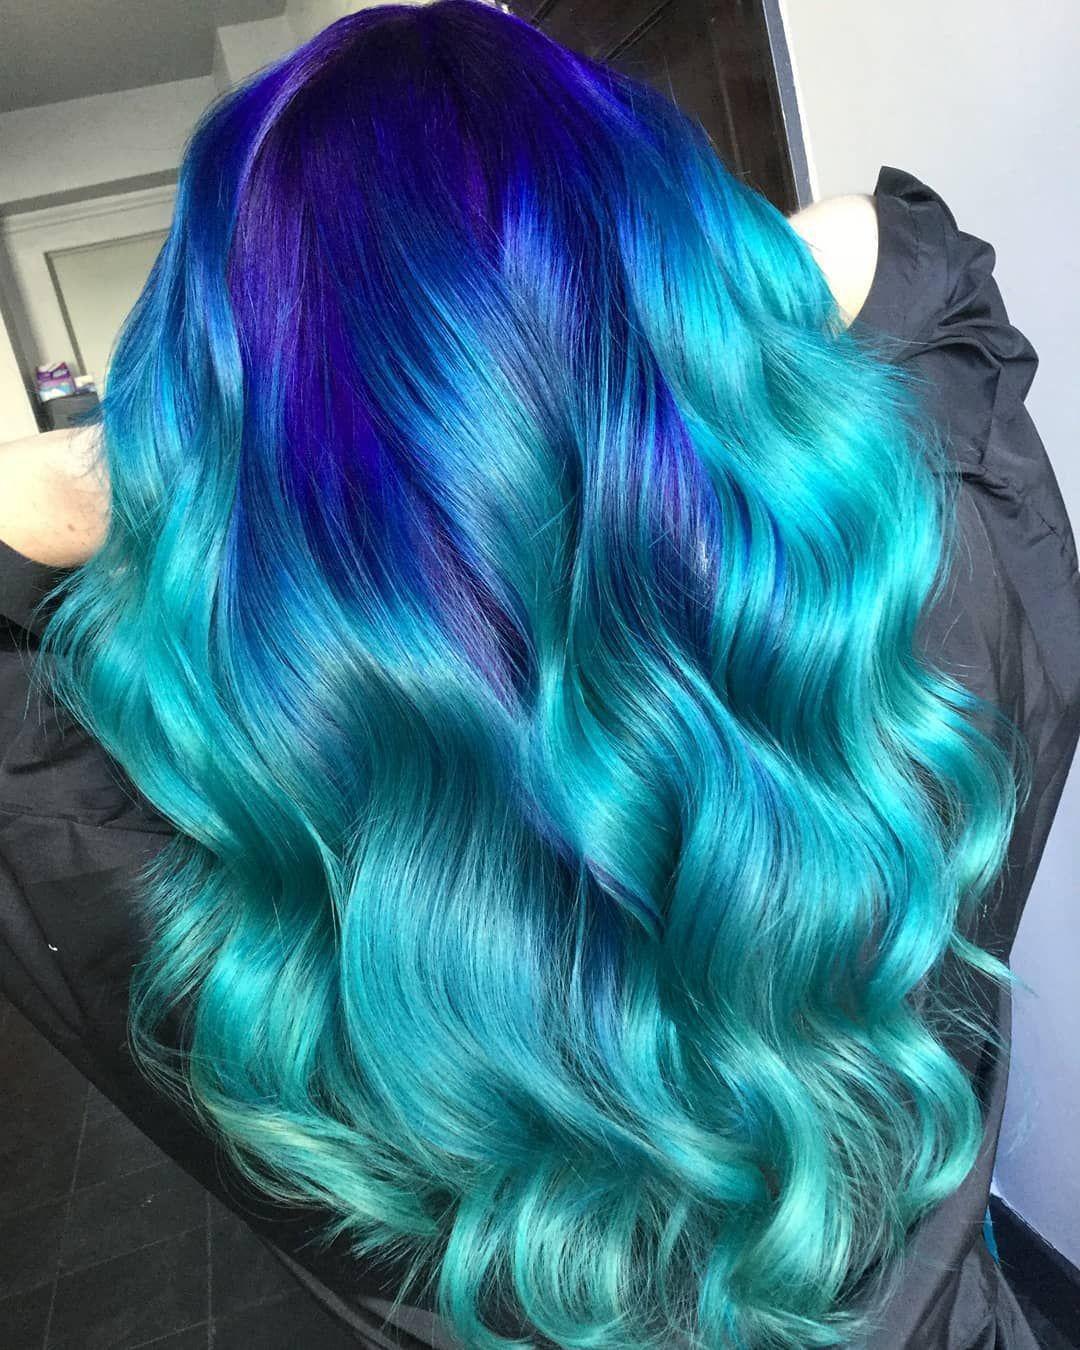 Winter Waves I Used Pravana Vivids Blue Blue Topaz For